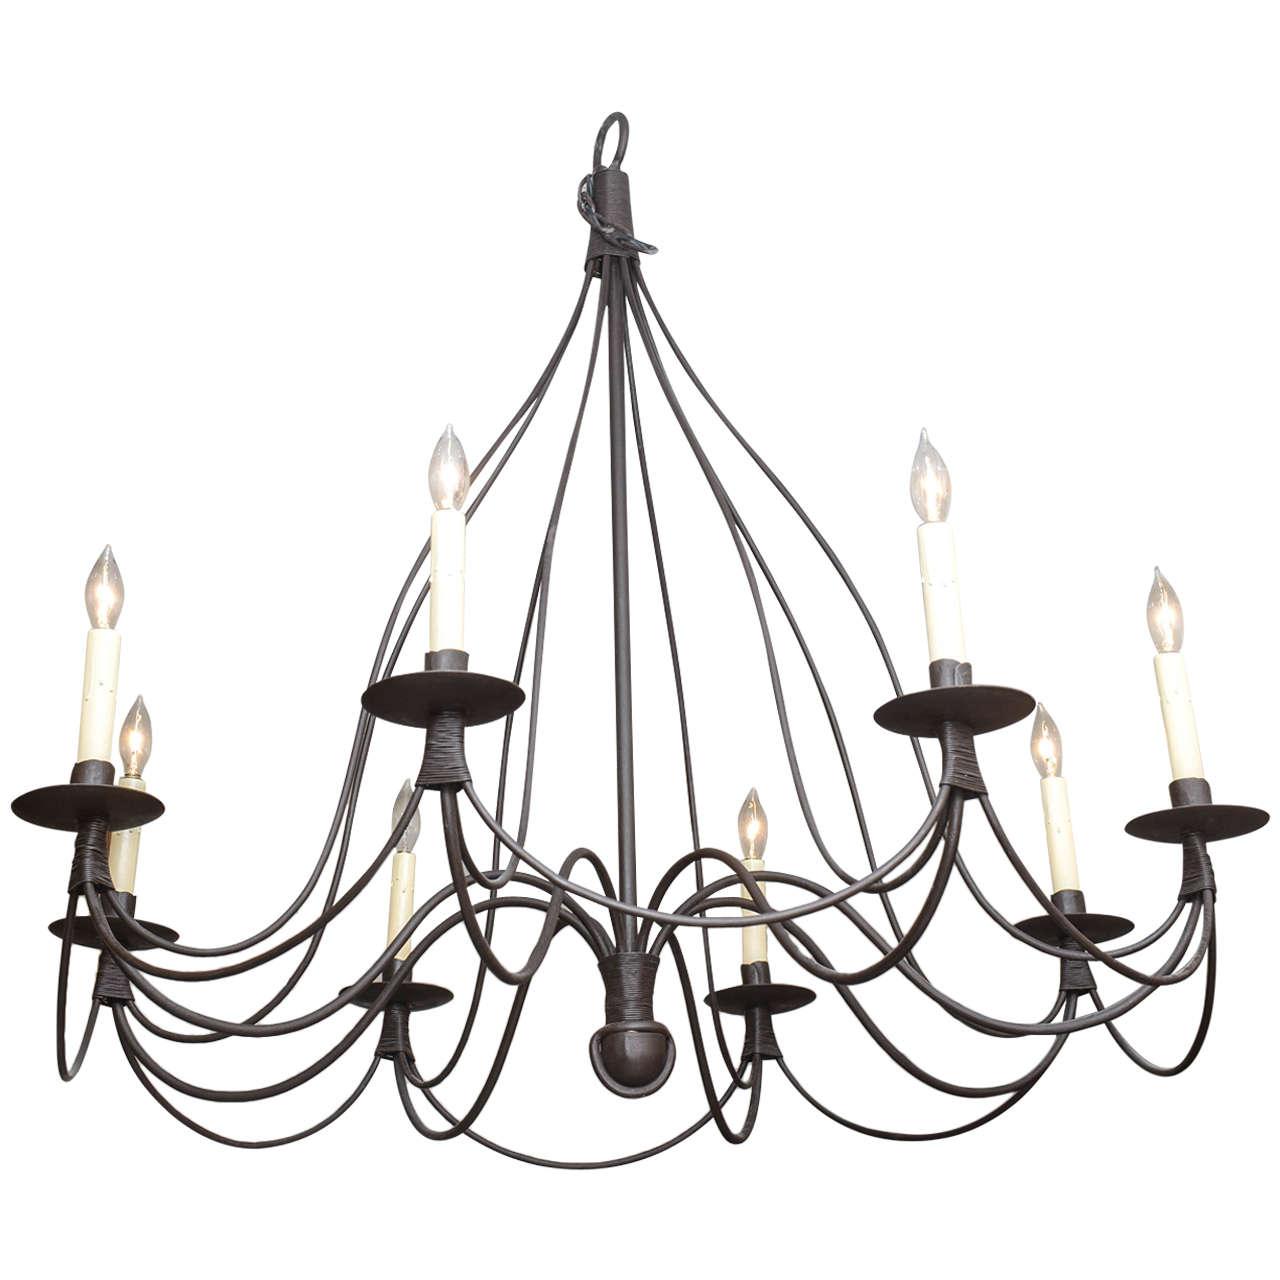 French iron chandelier chandelier designs eight light french iron chandelier at 1stdibs aloadofball Gallery